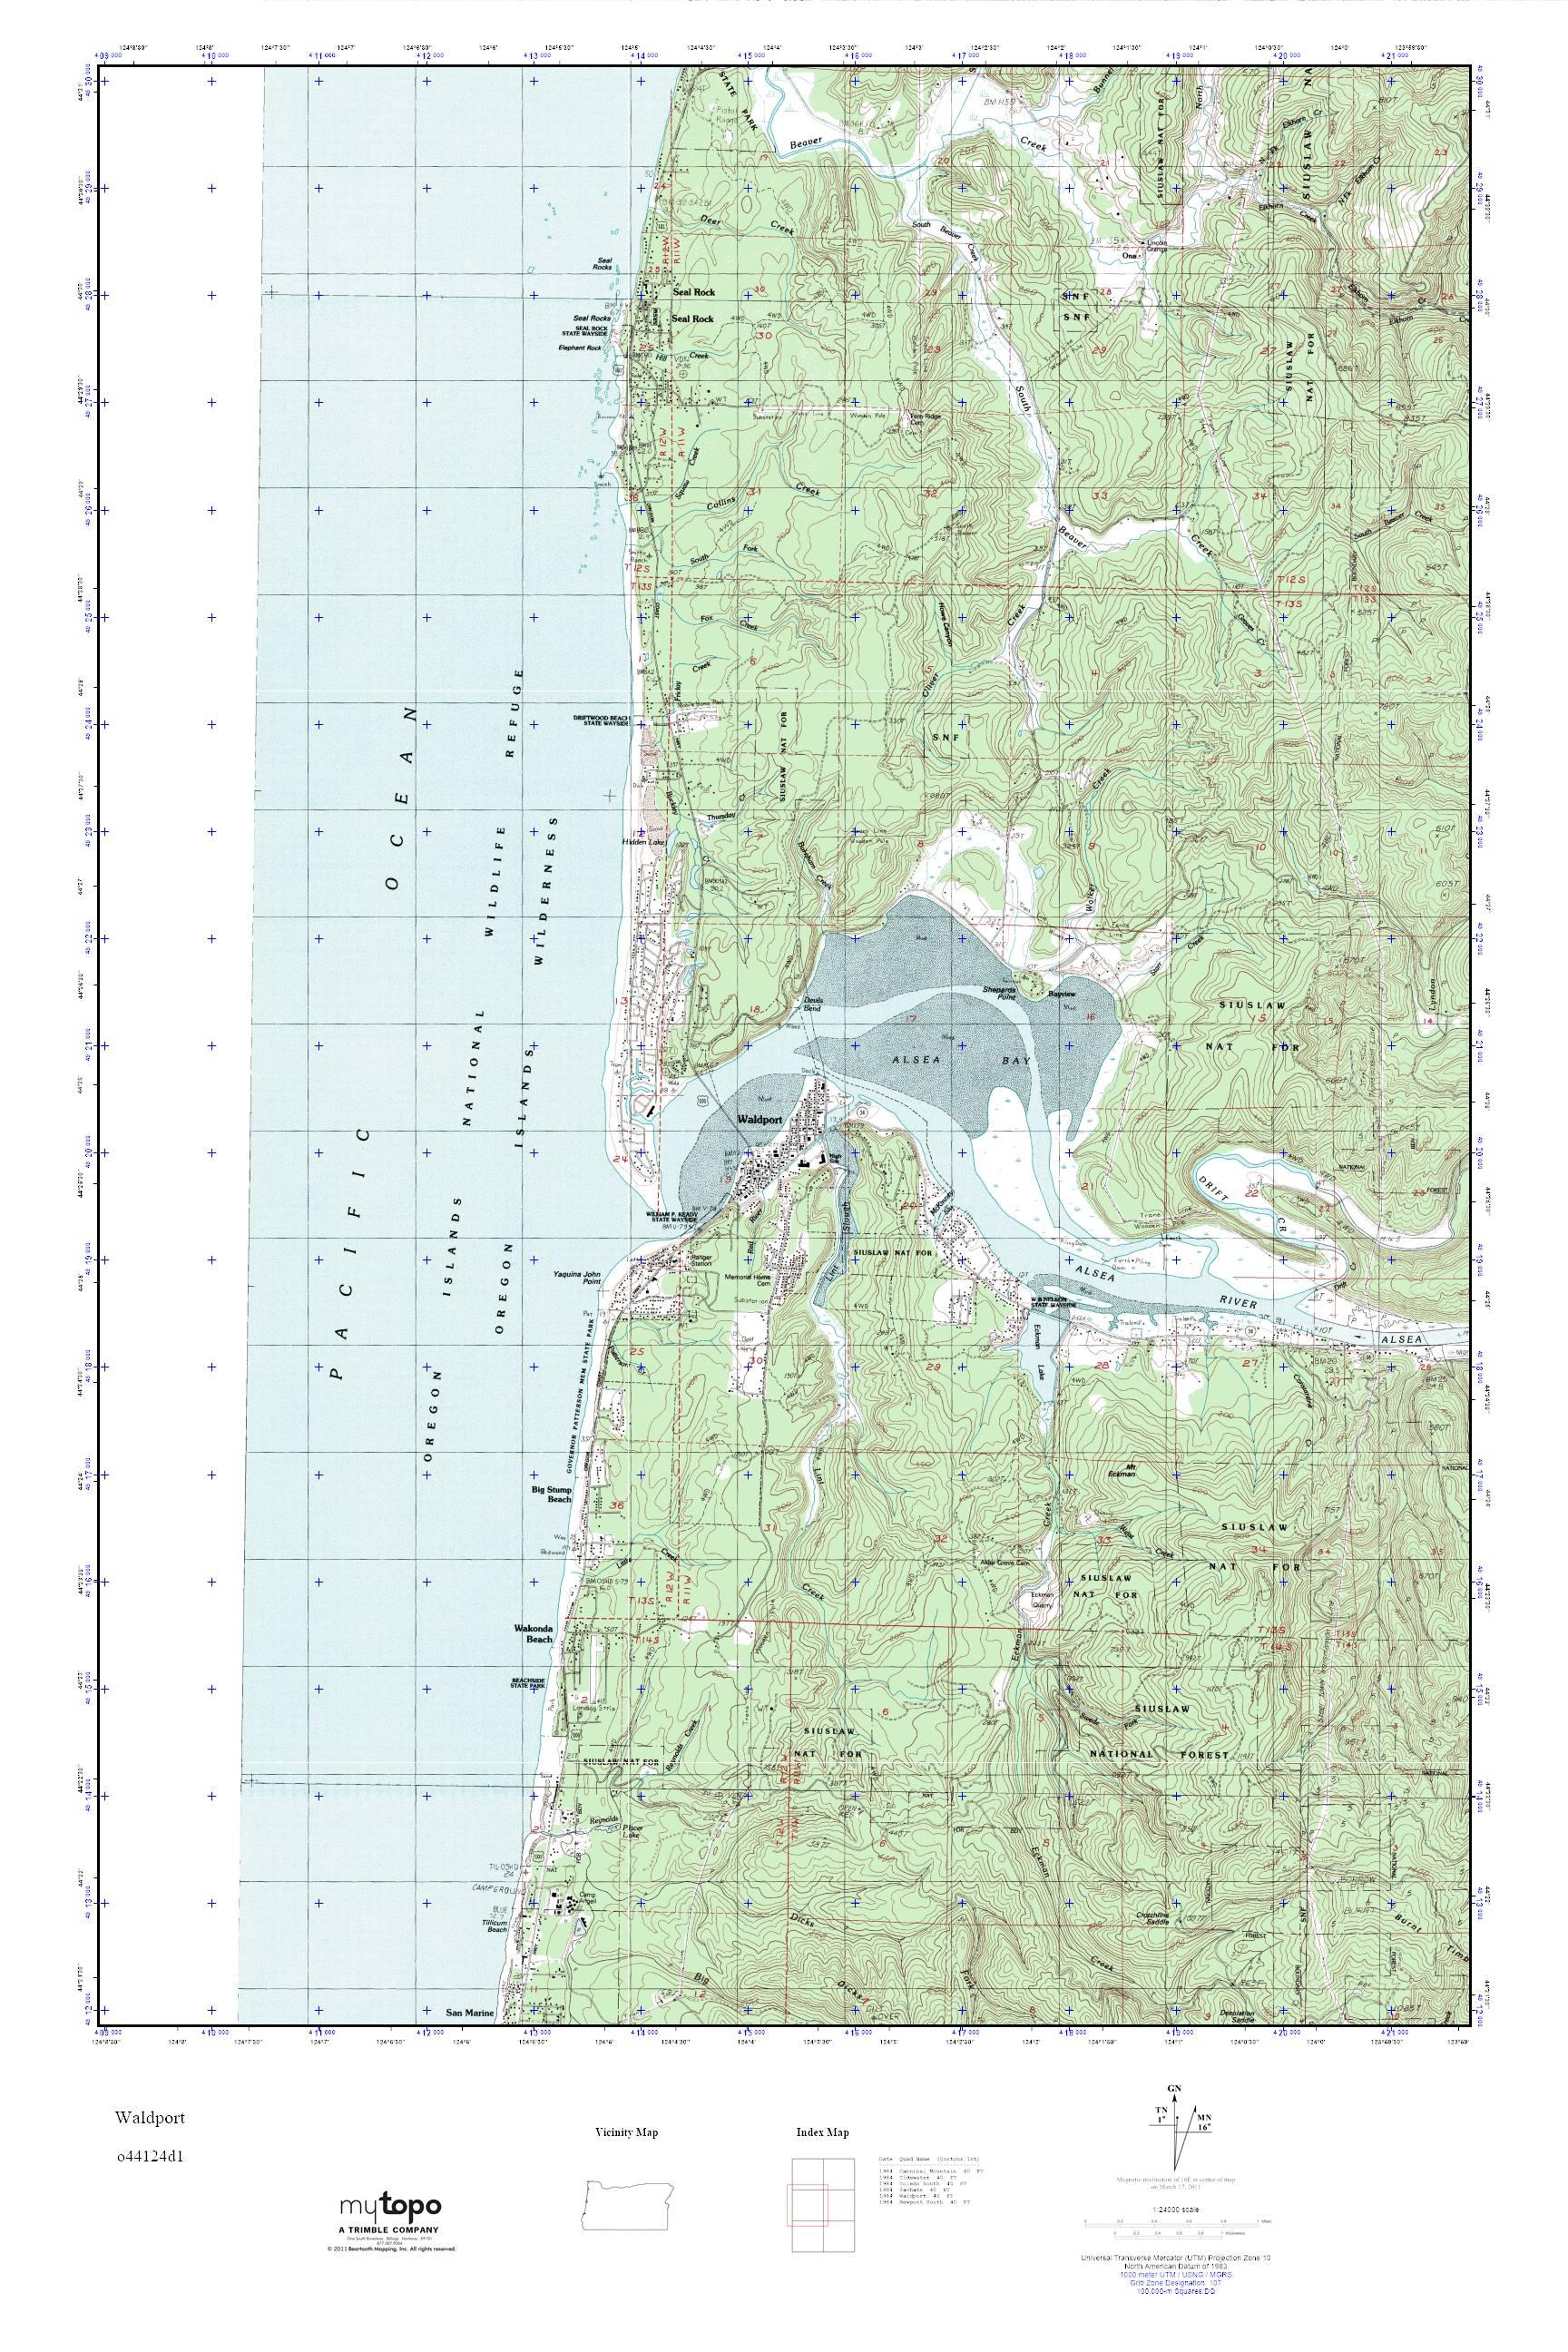 Mytopo Waldport Oregon Usgs Quad Topo Map